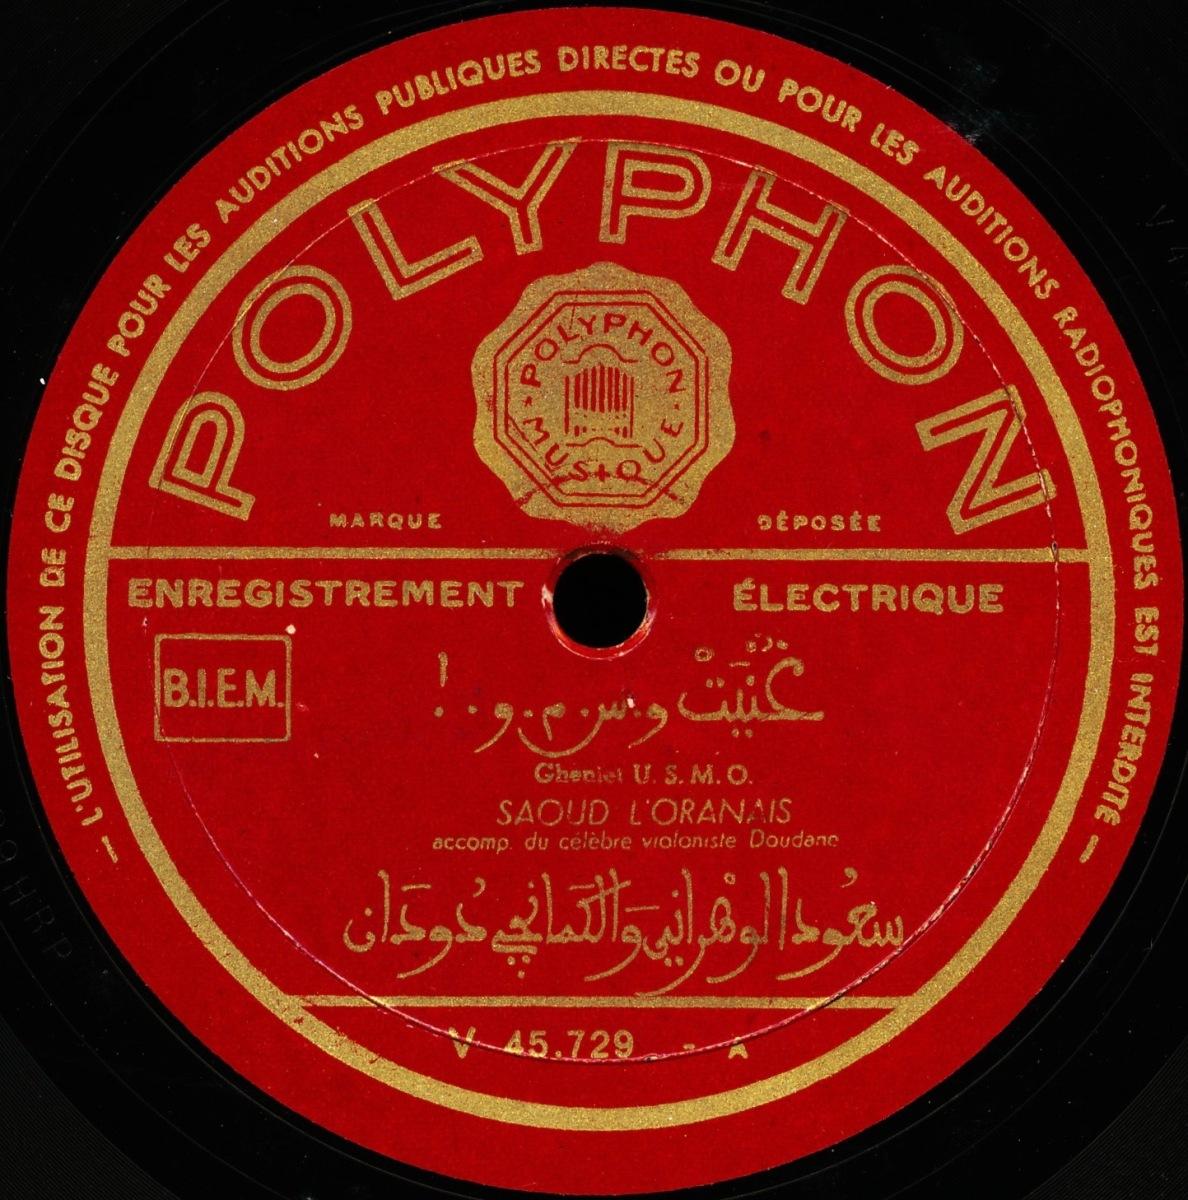 Saoud l'Oranais - Gheniet U.S.M.O. - Polyphon, 1934